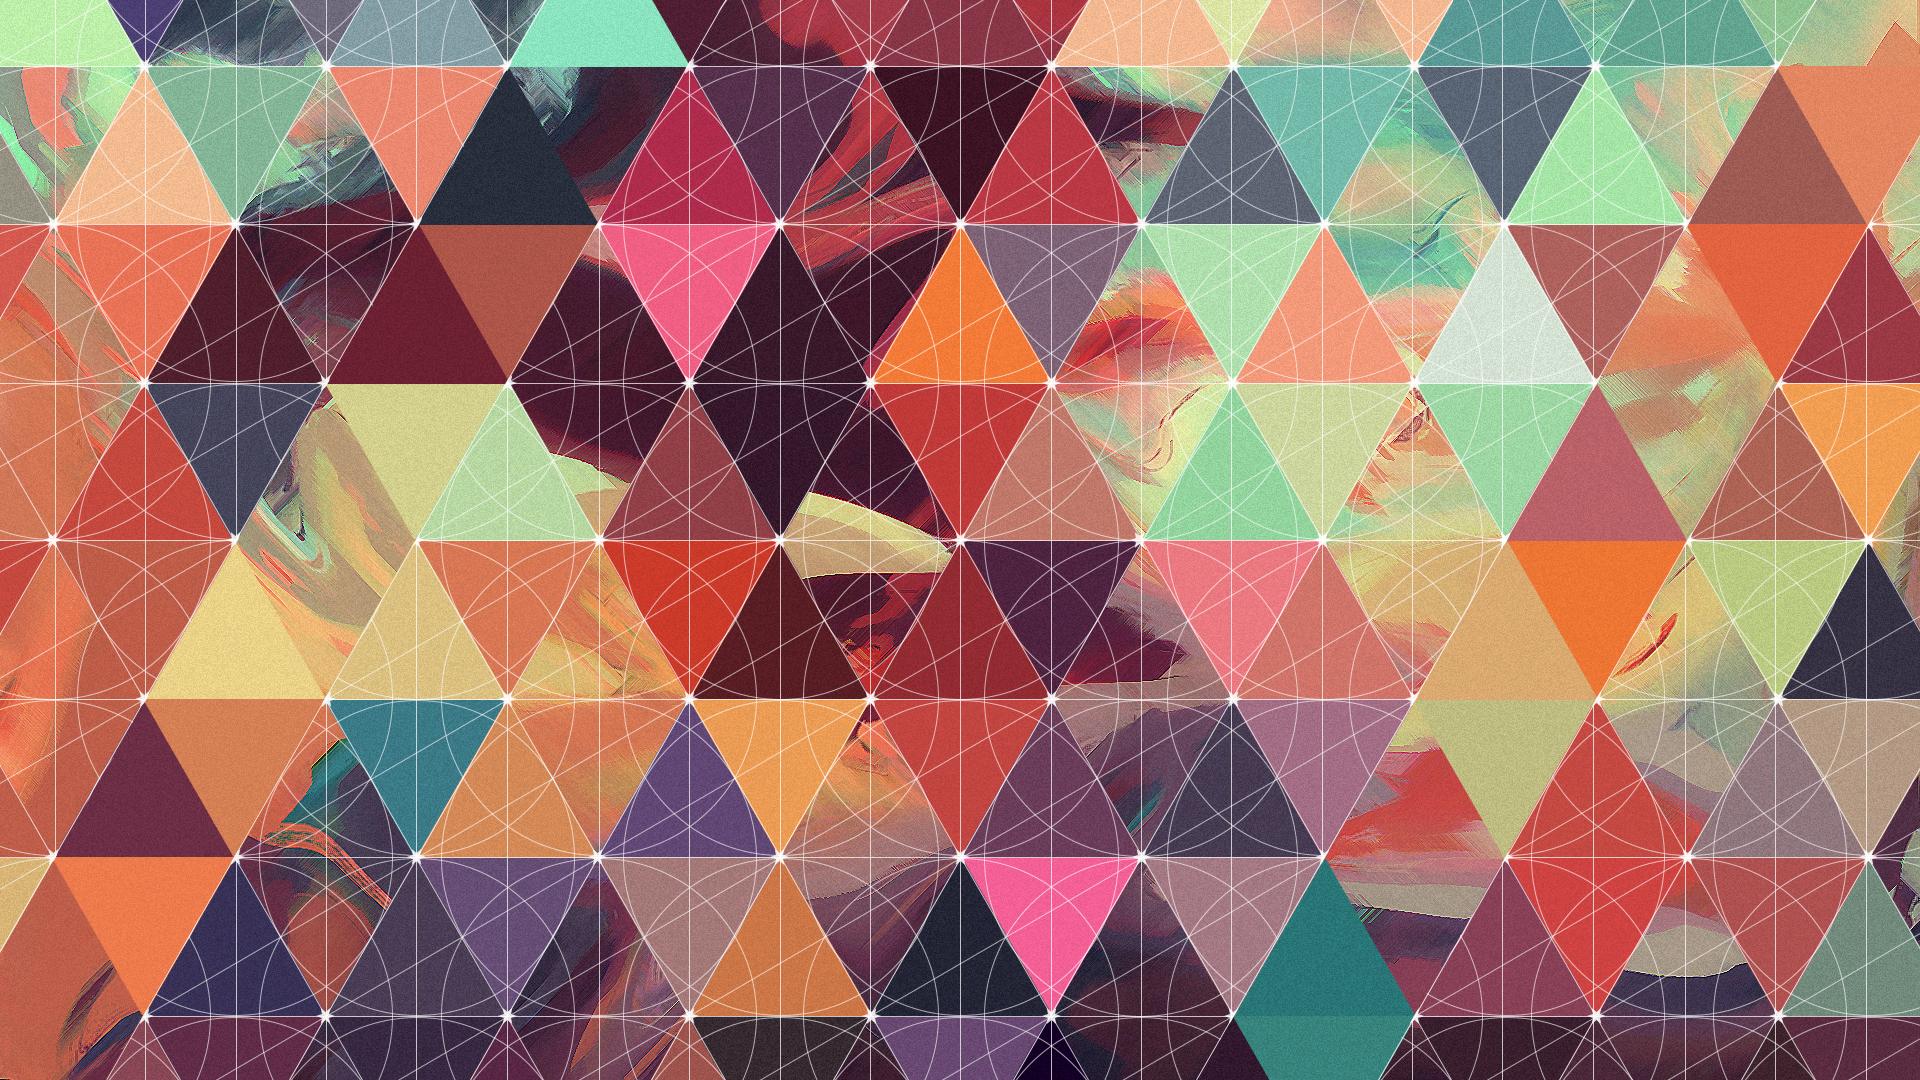 Best 57 Geometric Wallpaper on HipWallpaper Geometric Wallpaper 1920x1080